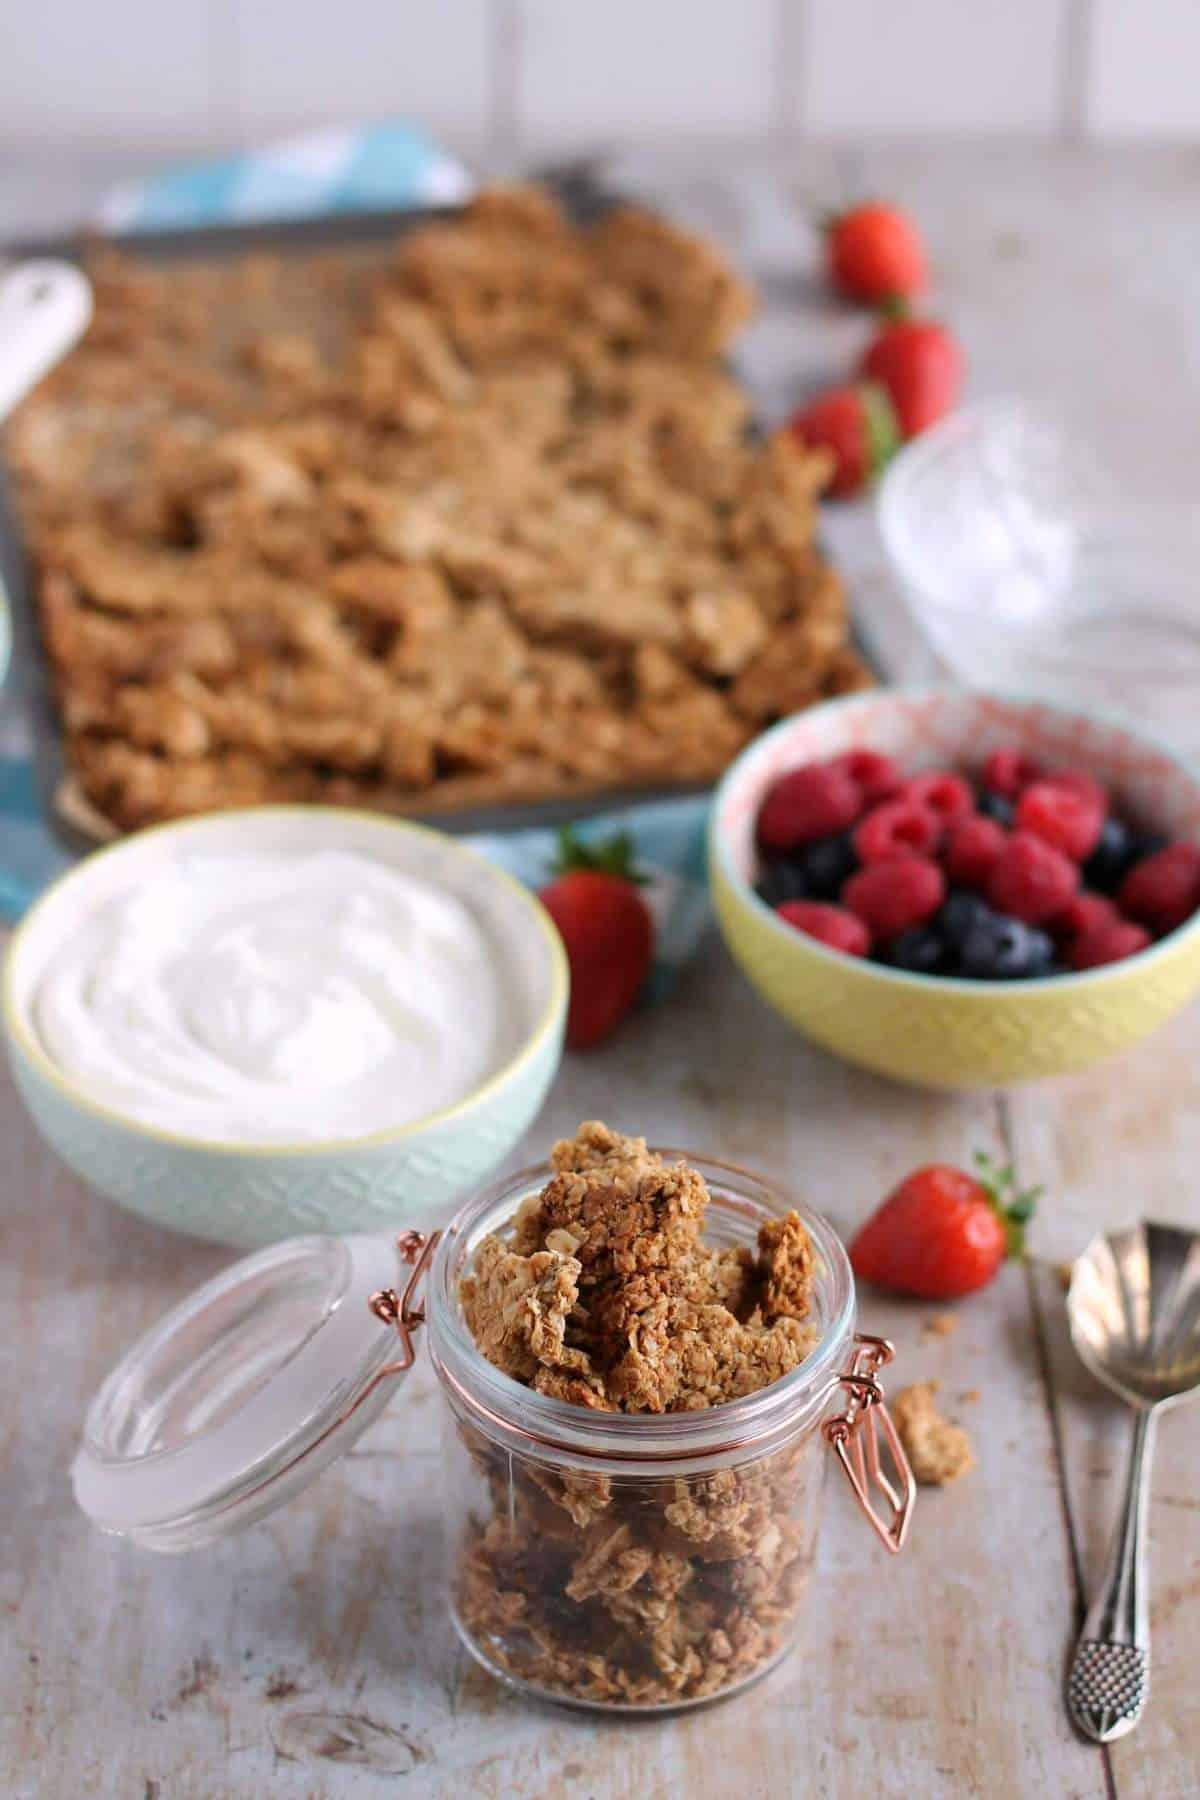 A kilner jar full of homemade peanut butter granola, with yogurt and fresh berries